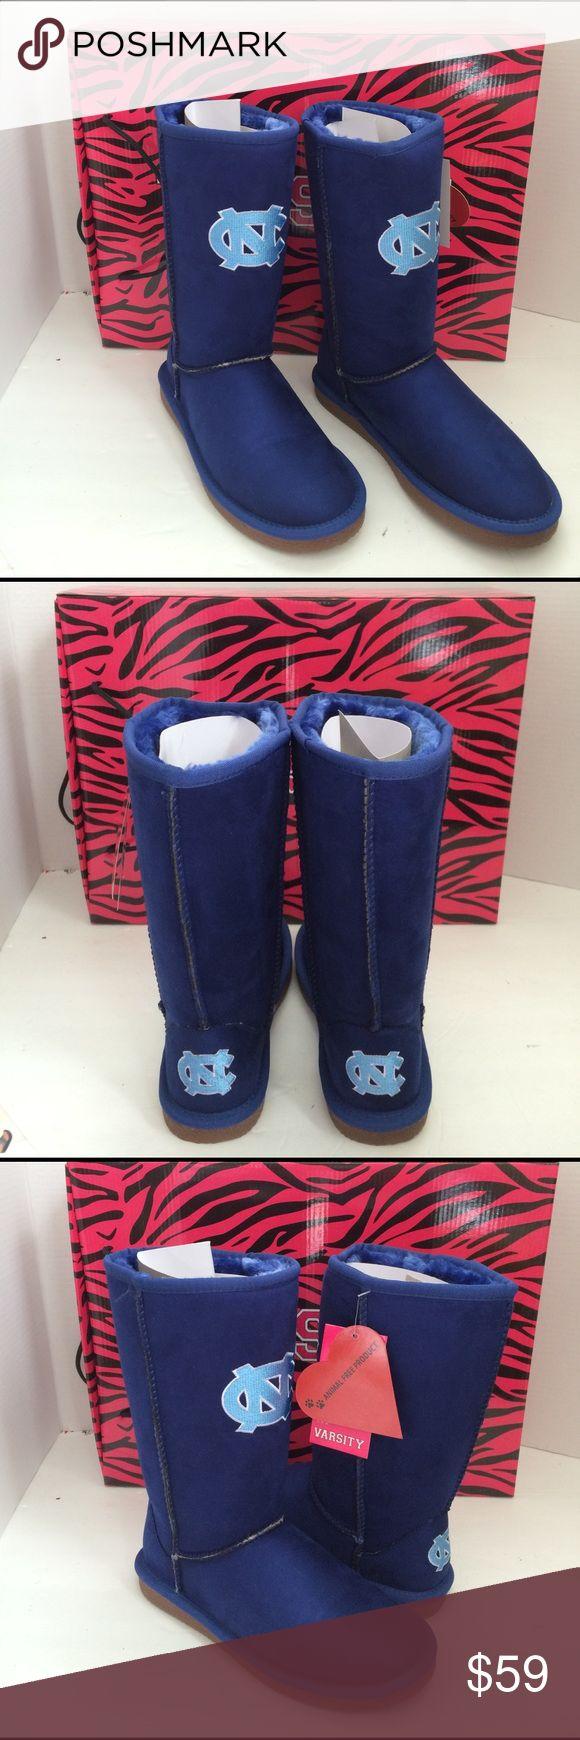 Cuce Shoes UNC Tarheels Blue Fur Lined Boots 6 Cuce Shoes UNC University of North Carolina Tarheels Blue Fur Lined Boots 6 Cuce Shoes Winter & Rain Boots